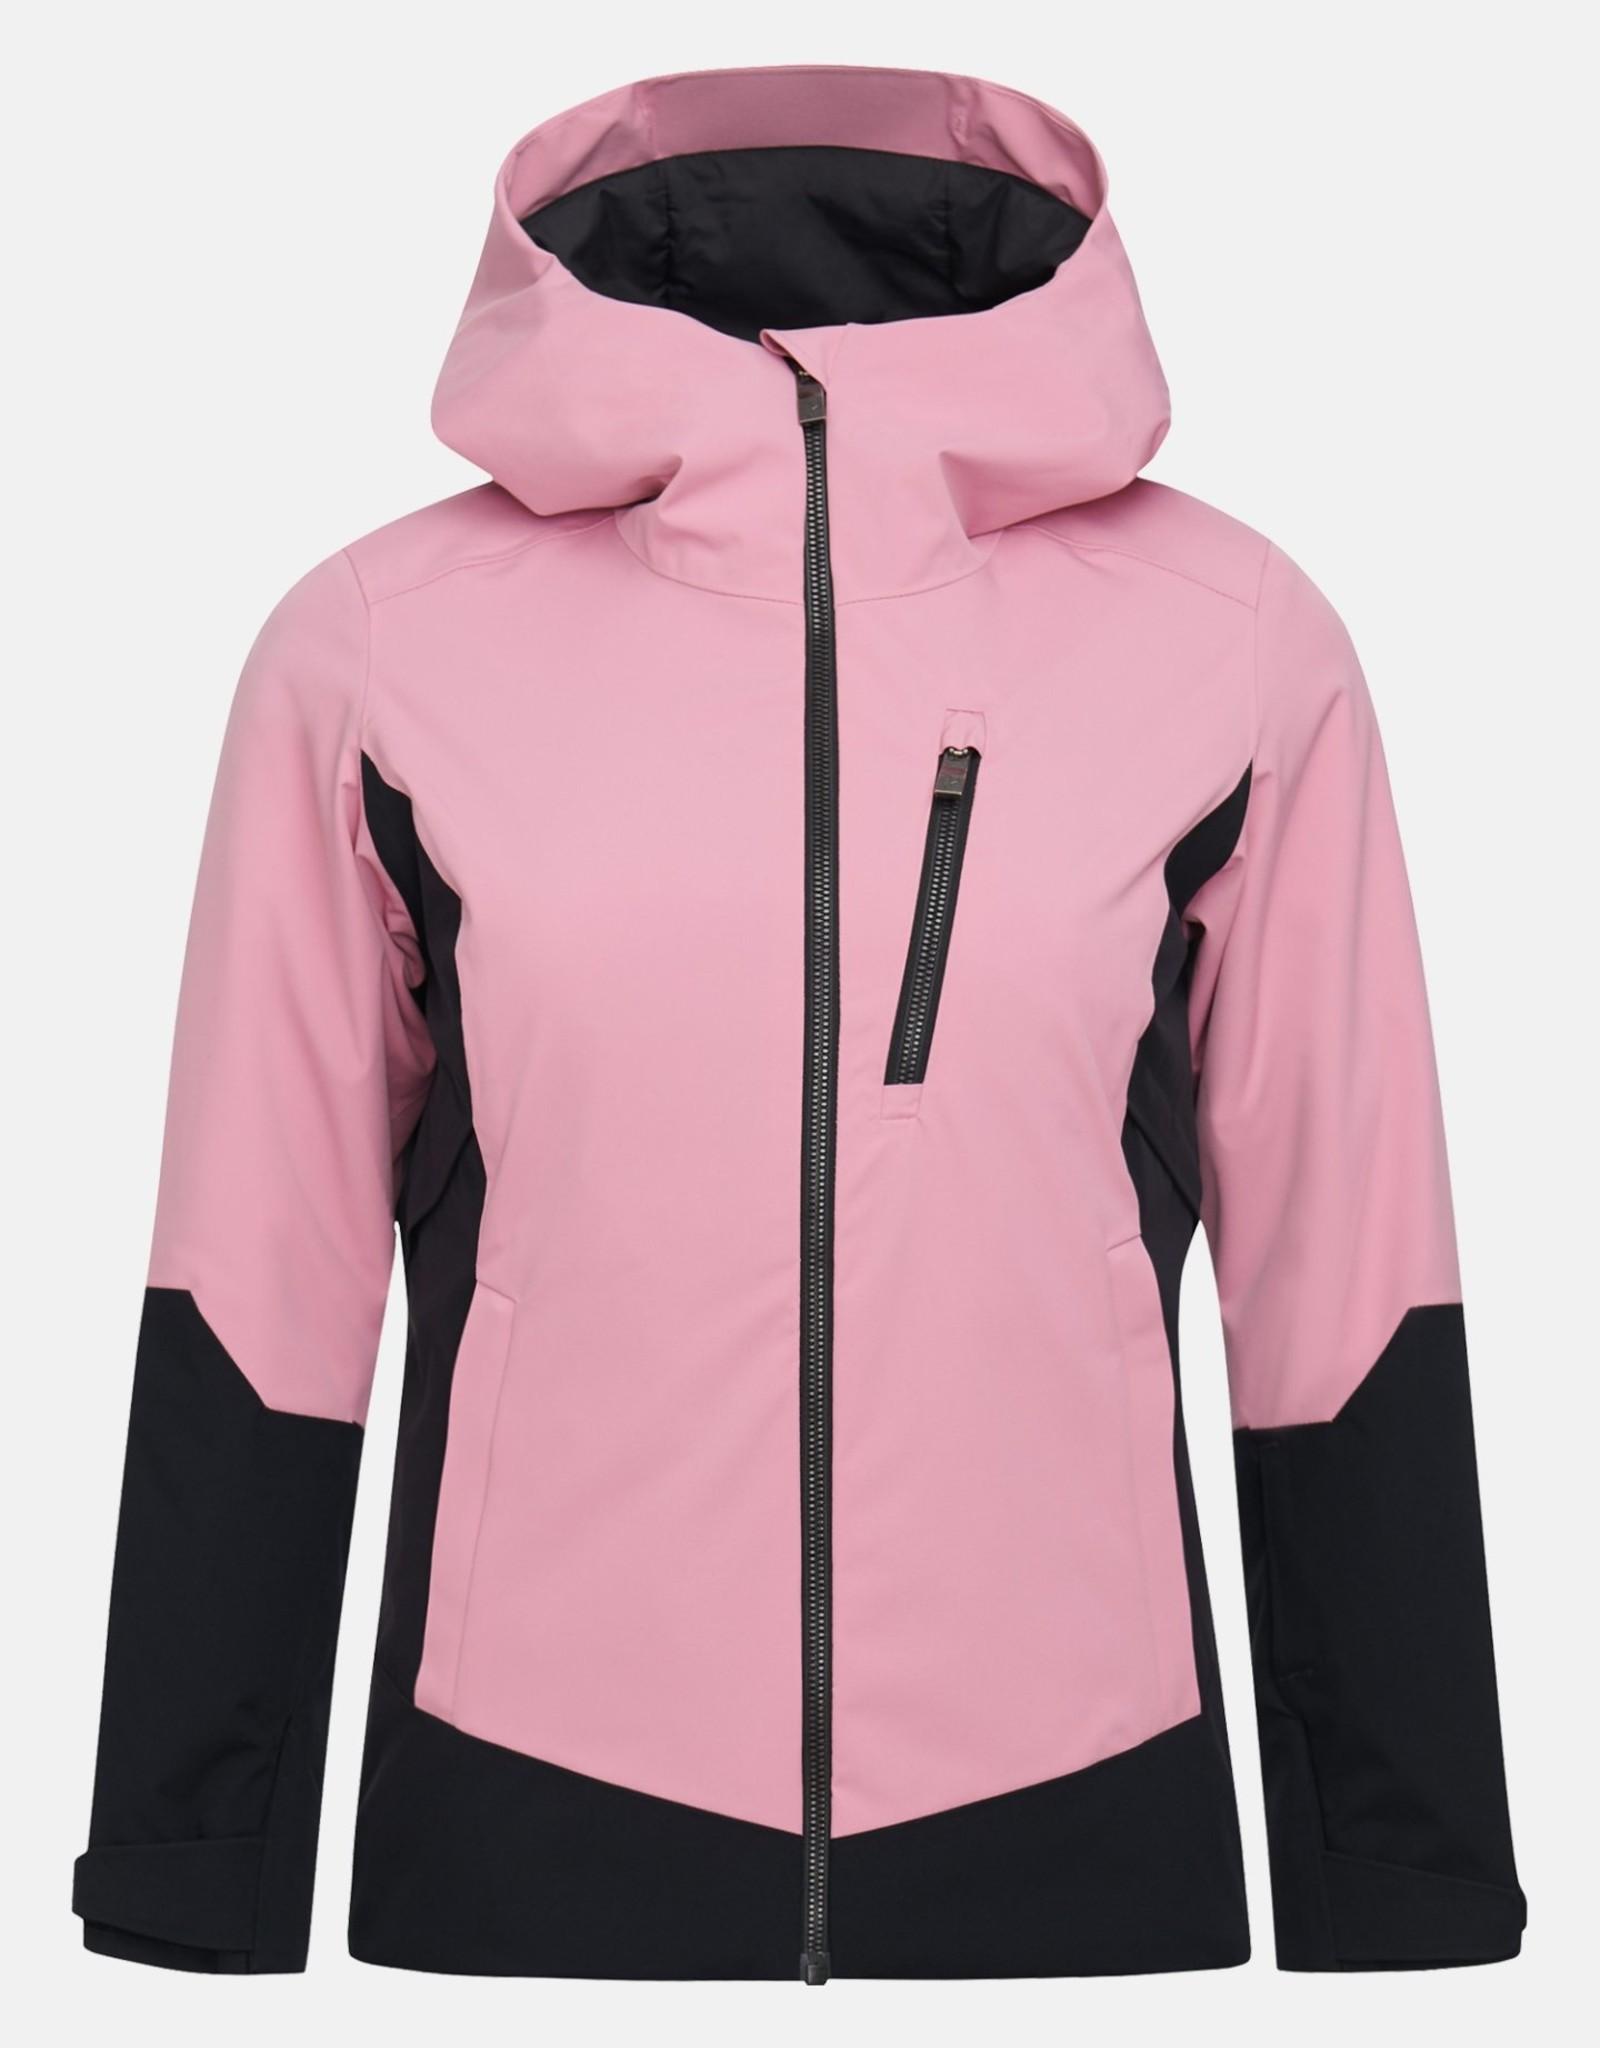 Peak Performance Scoot jacket dames (ref G66595011)